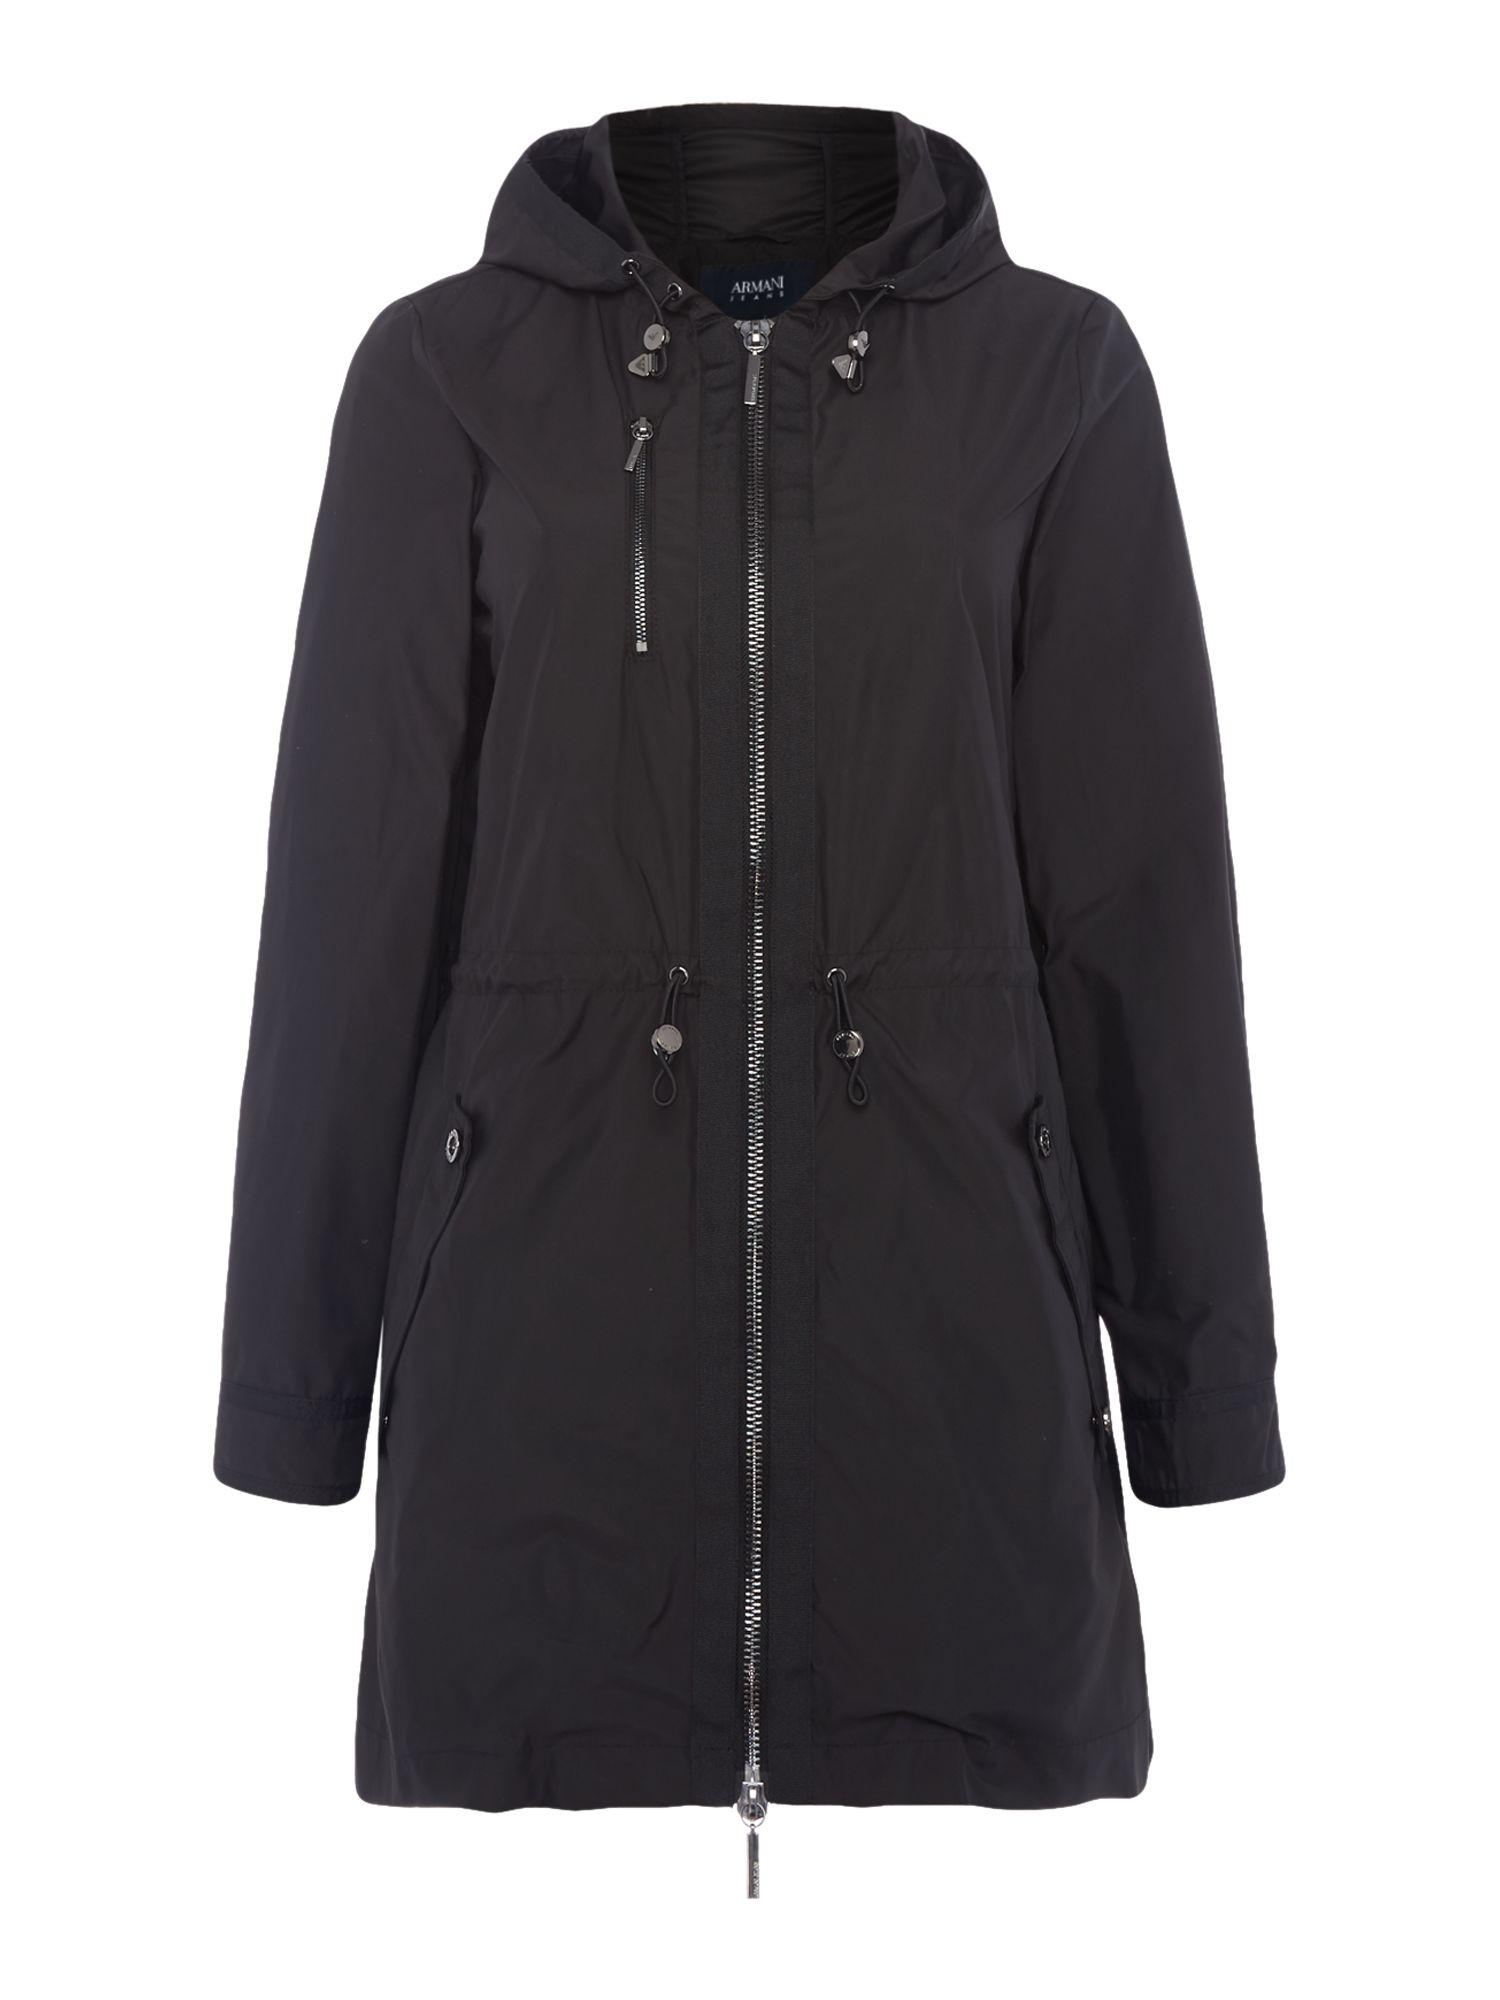 House of fraser womens coats